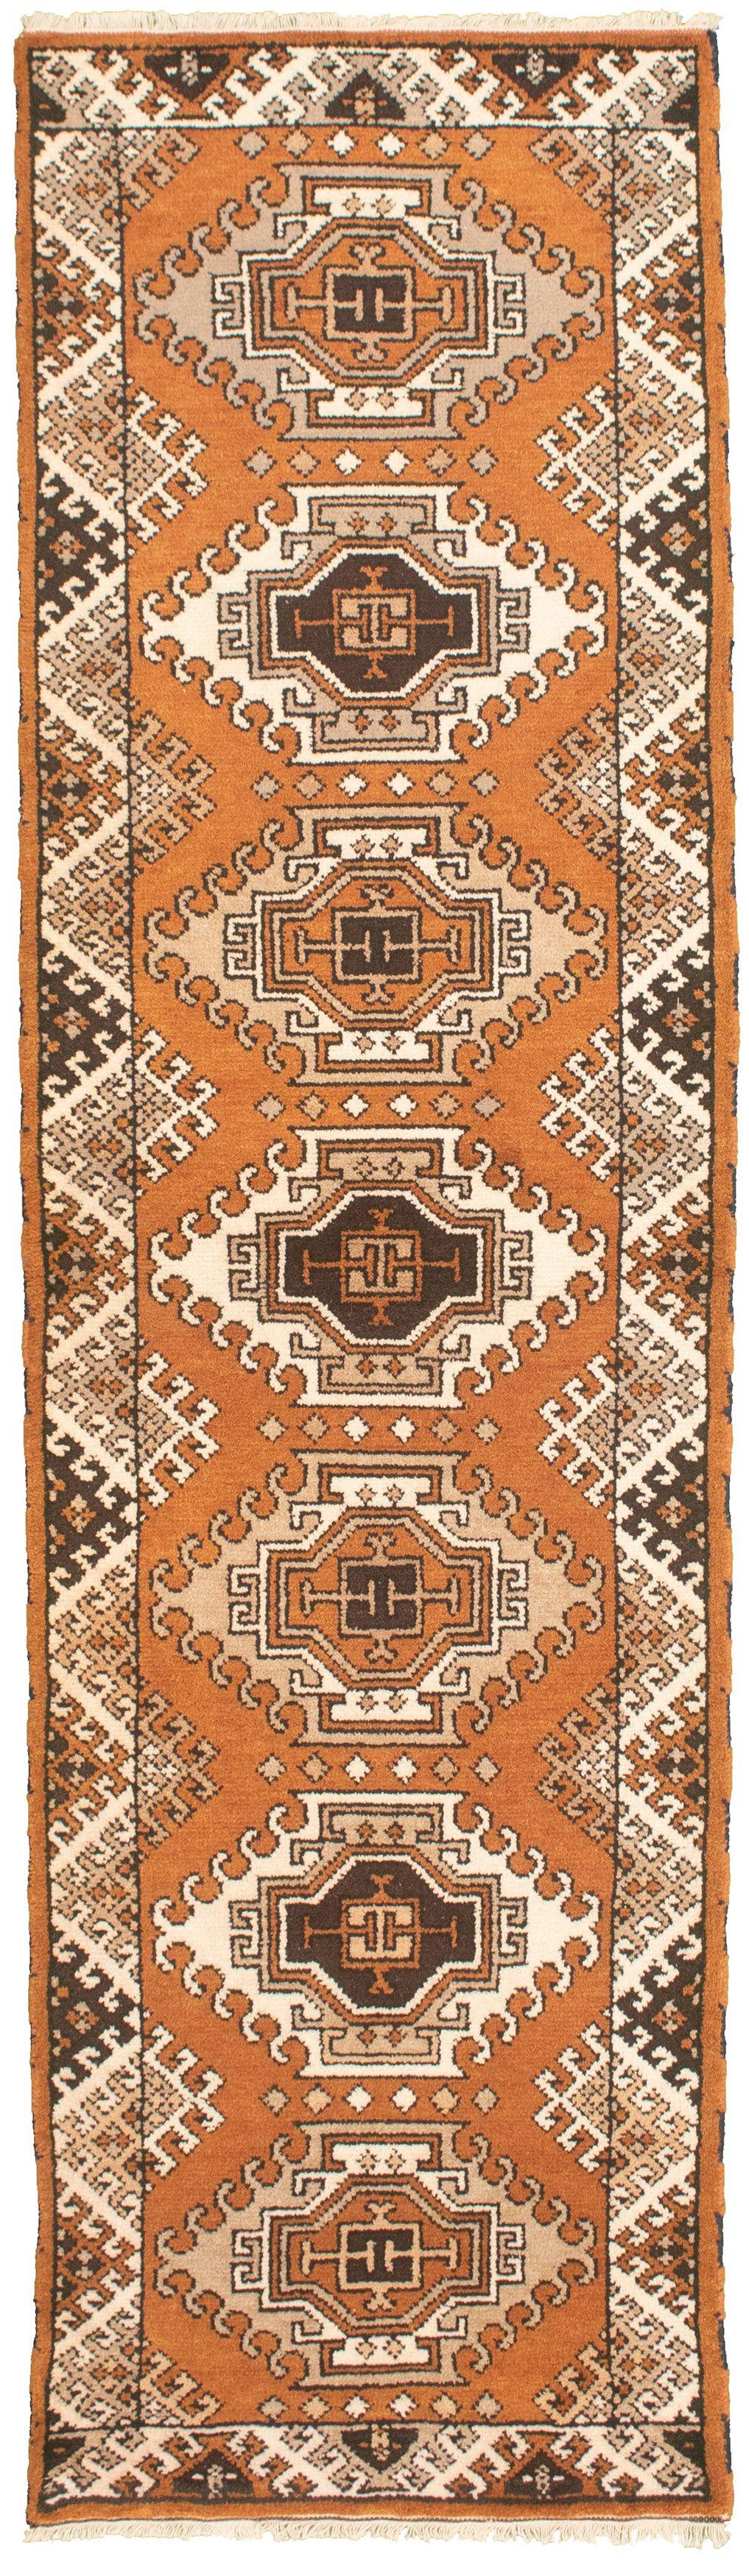 "Hand-knotted Royal Kazak Light Brown Wool Rug 2'8"" x 9'9""  Size: 2'8"" x 9'9"""